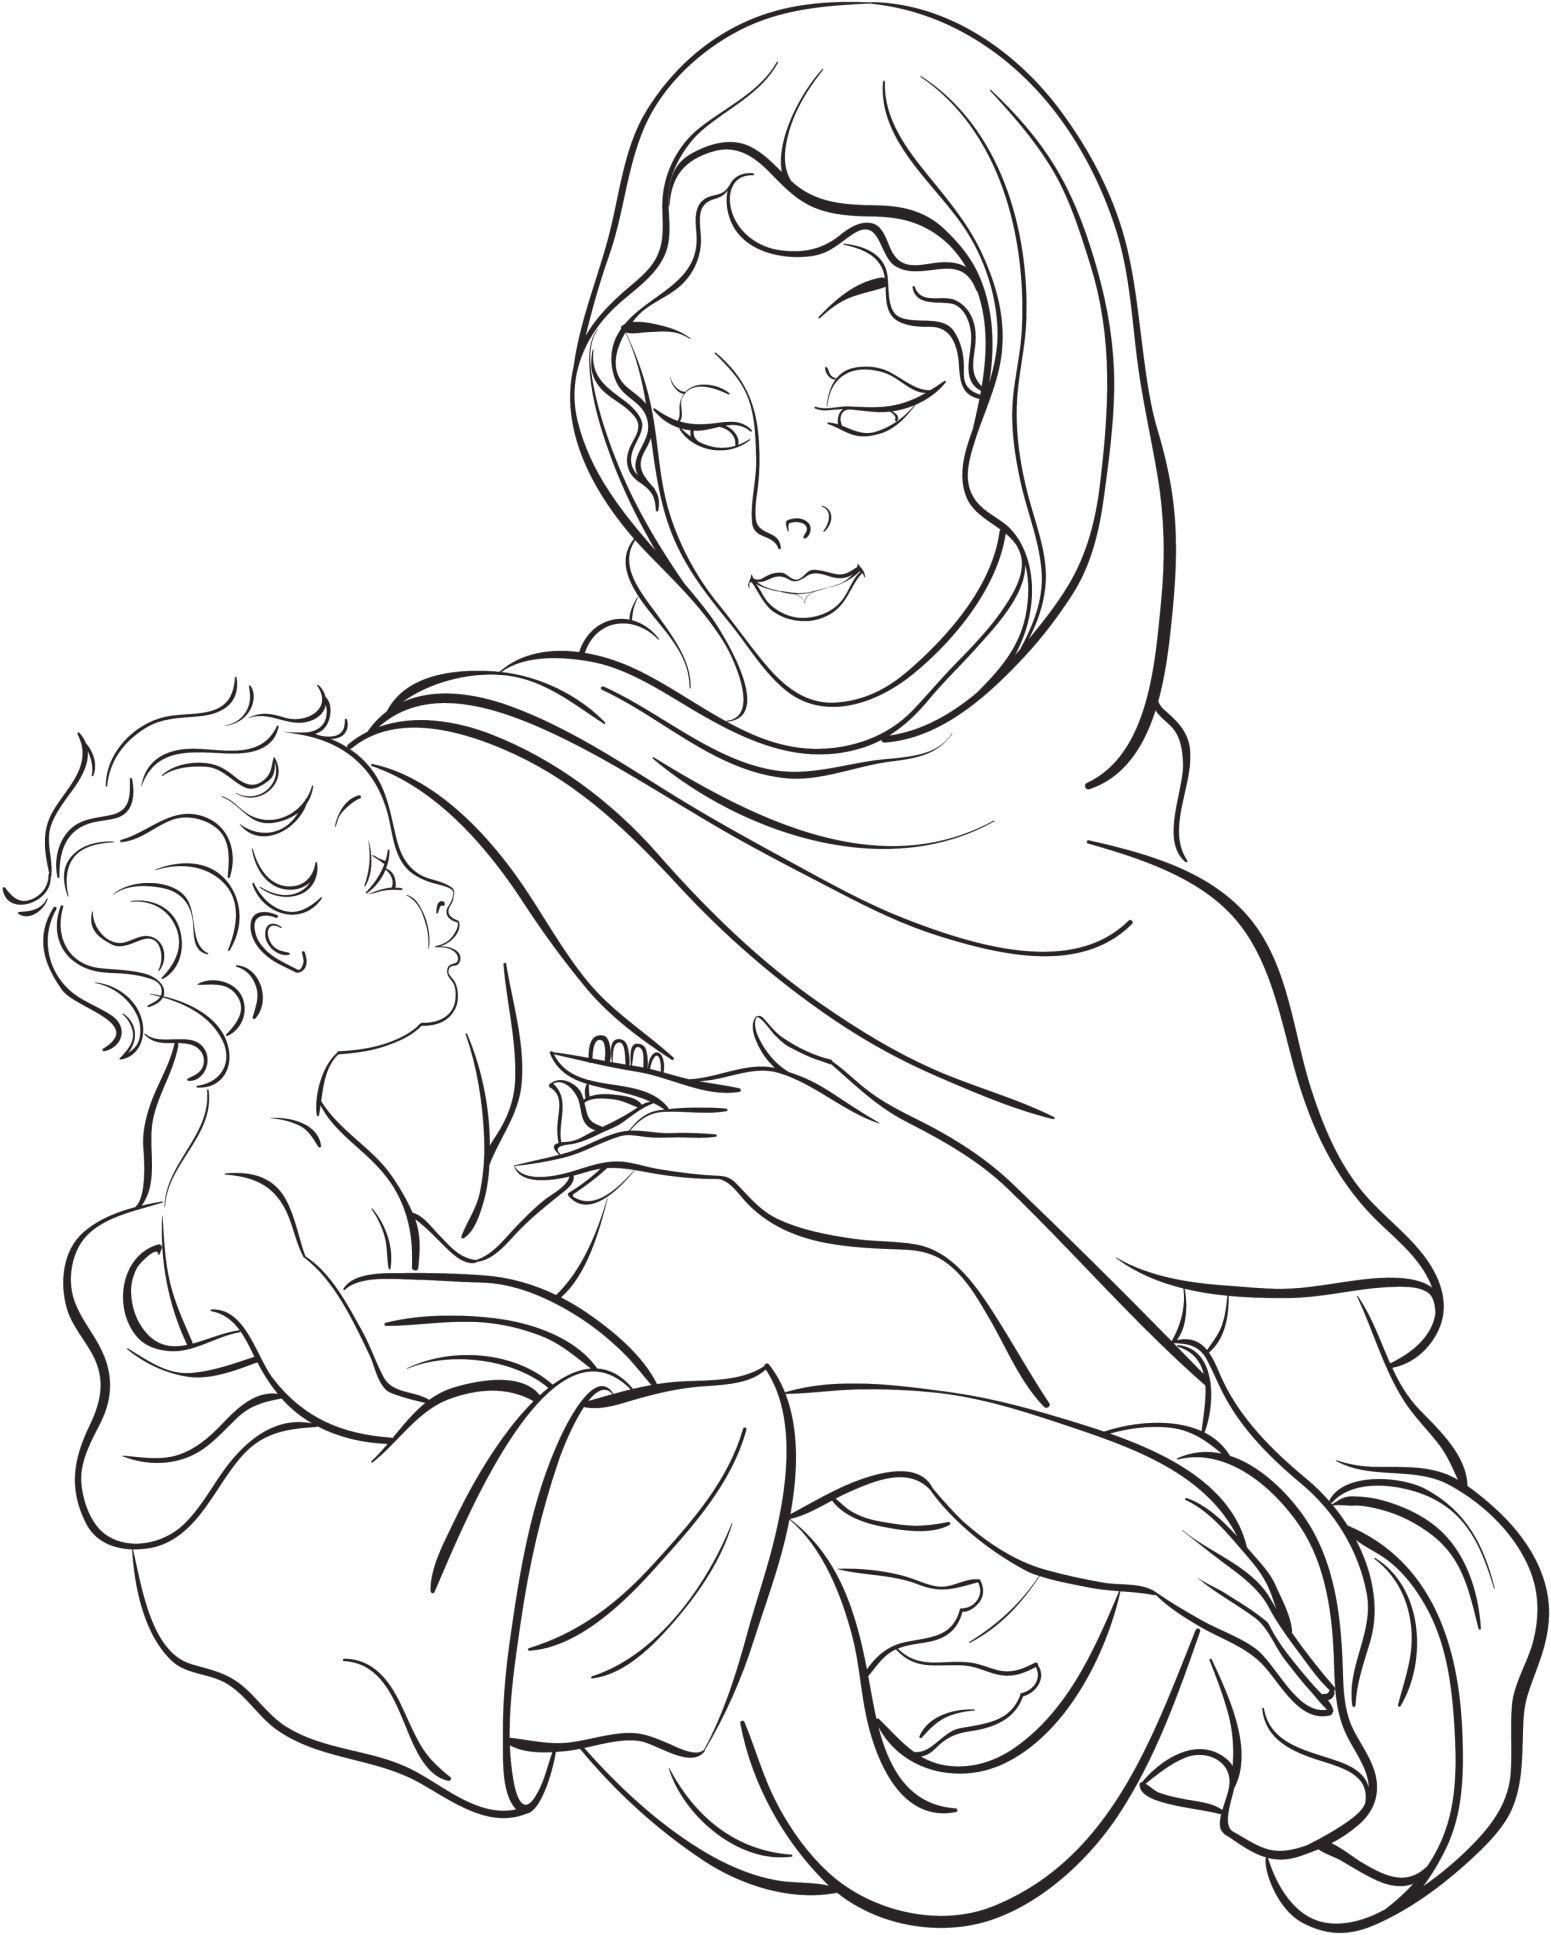 DibujosdelDiadelaMadreparaimprimir6jpg 15511935